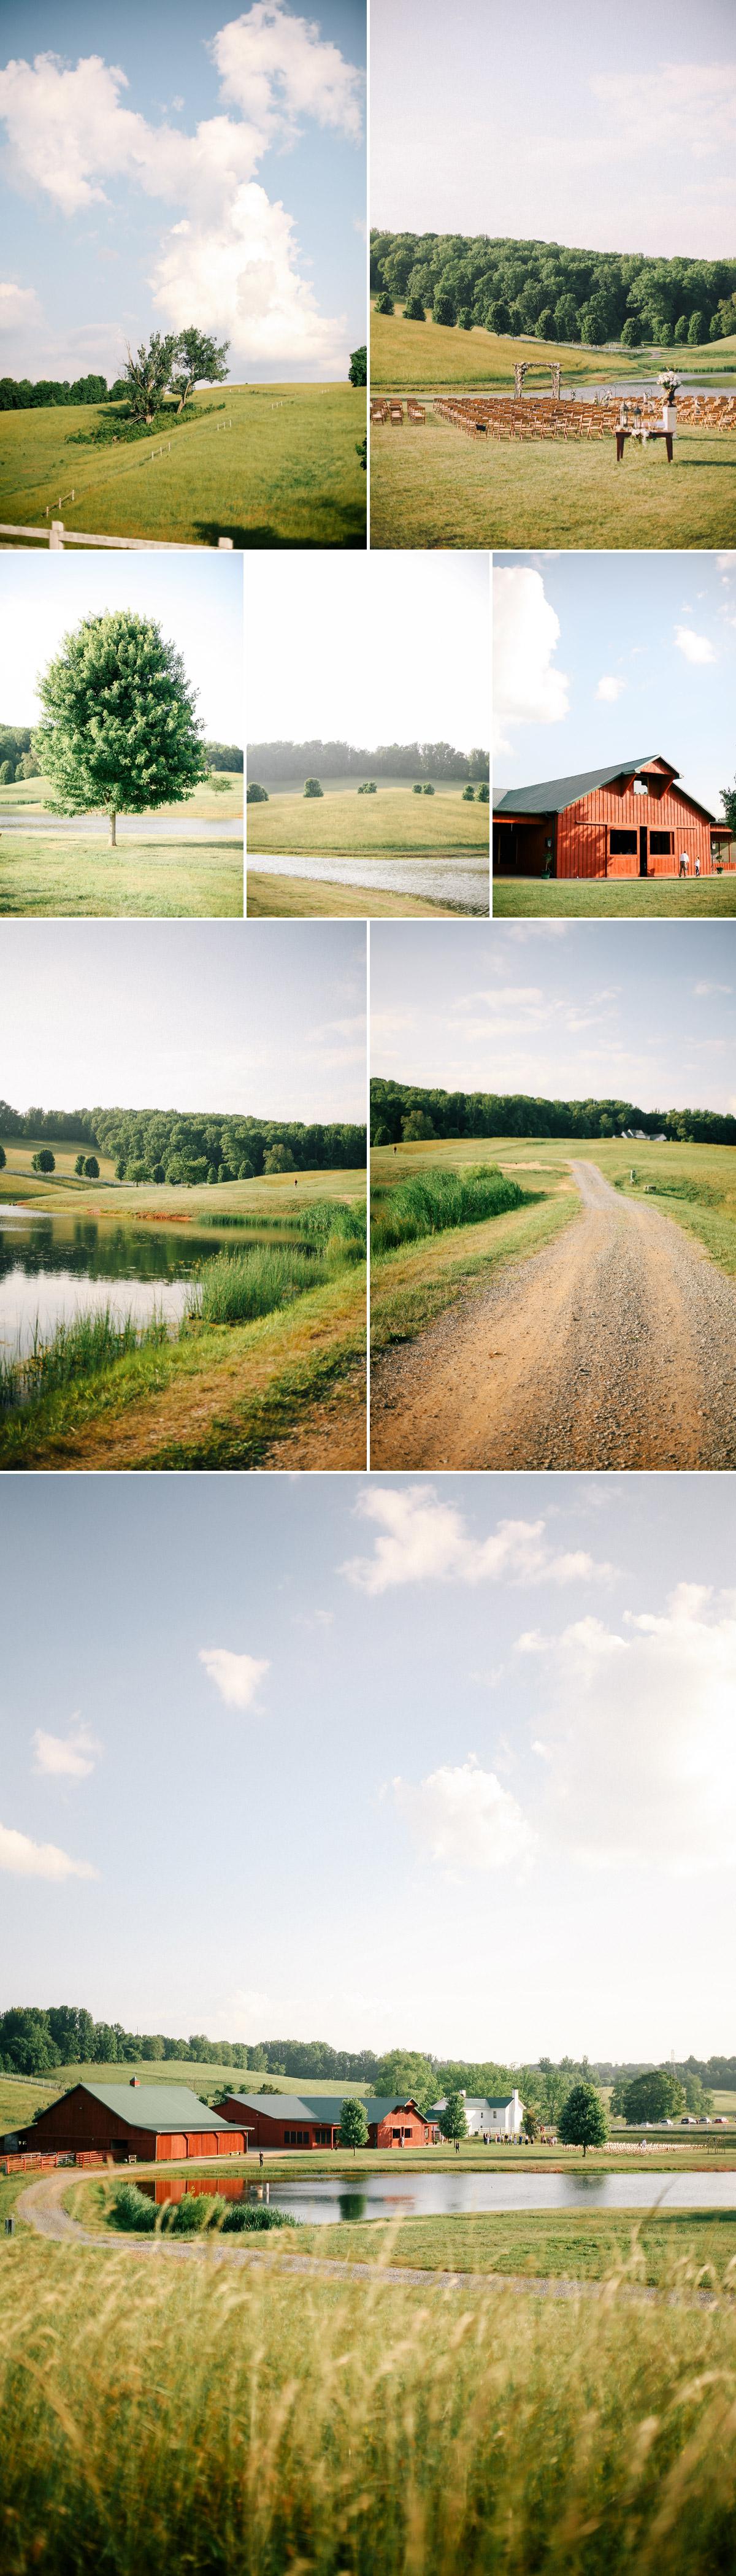 Blog-Collage-1401688160553.jpg